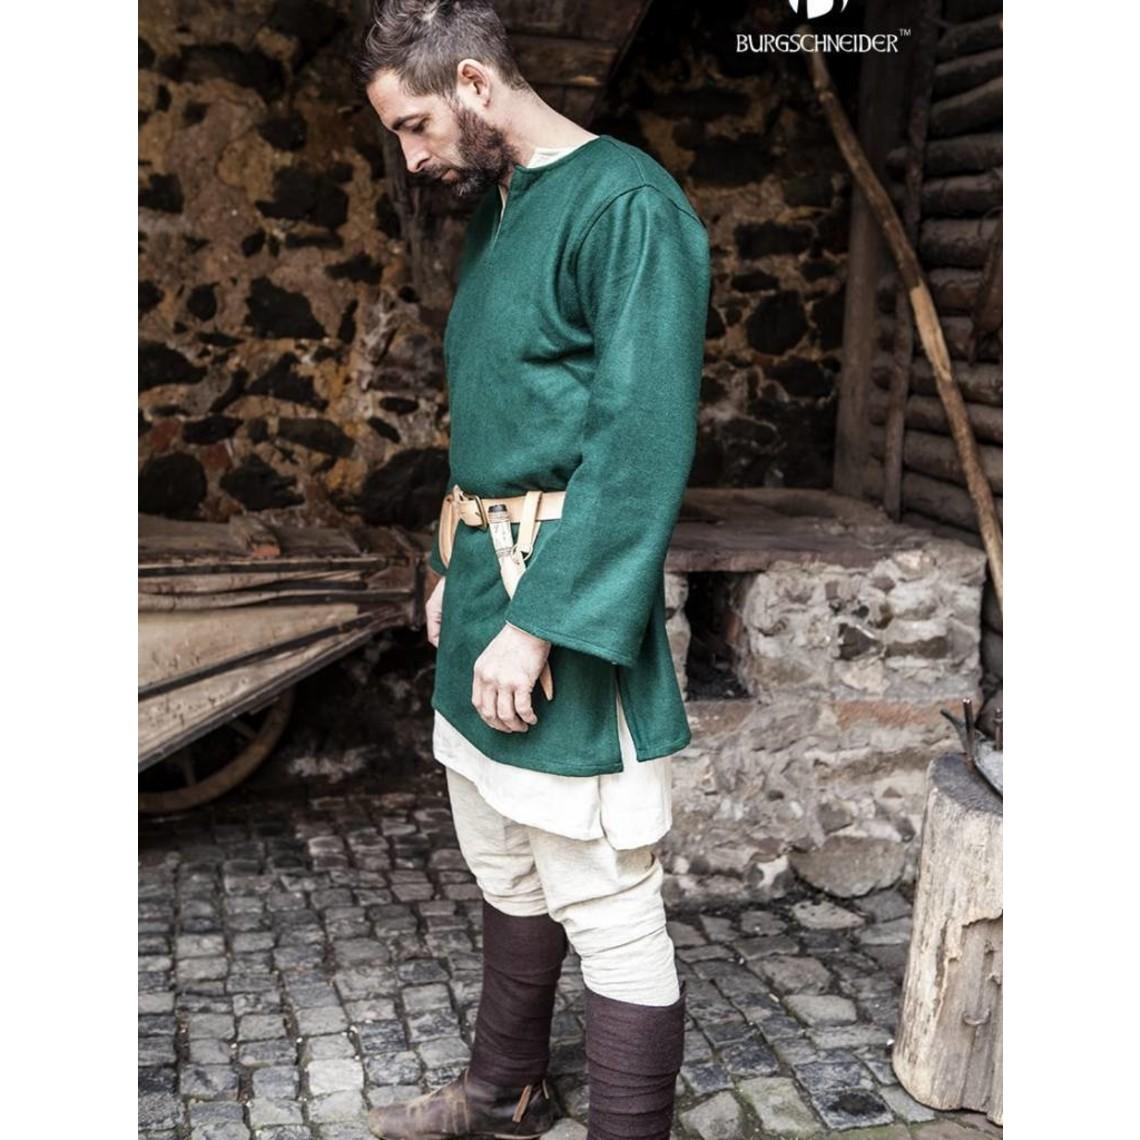 Burgschneider Tunique Lodin, vert